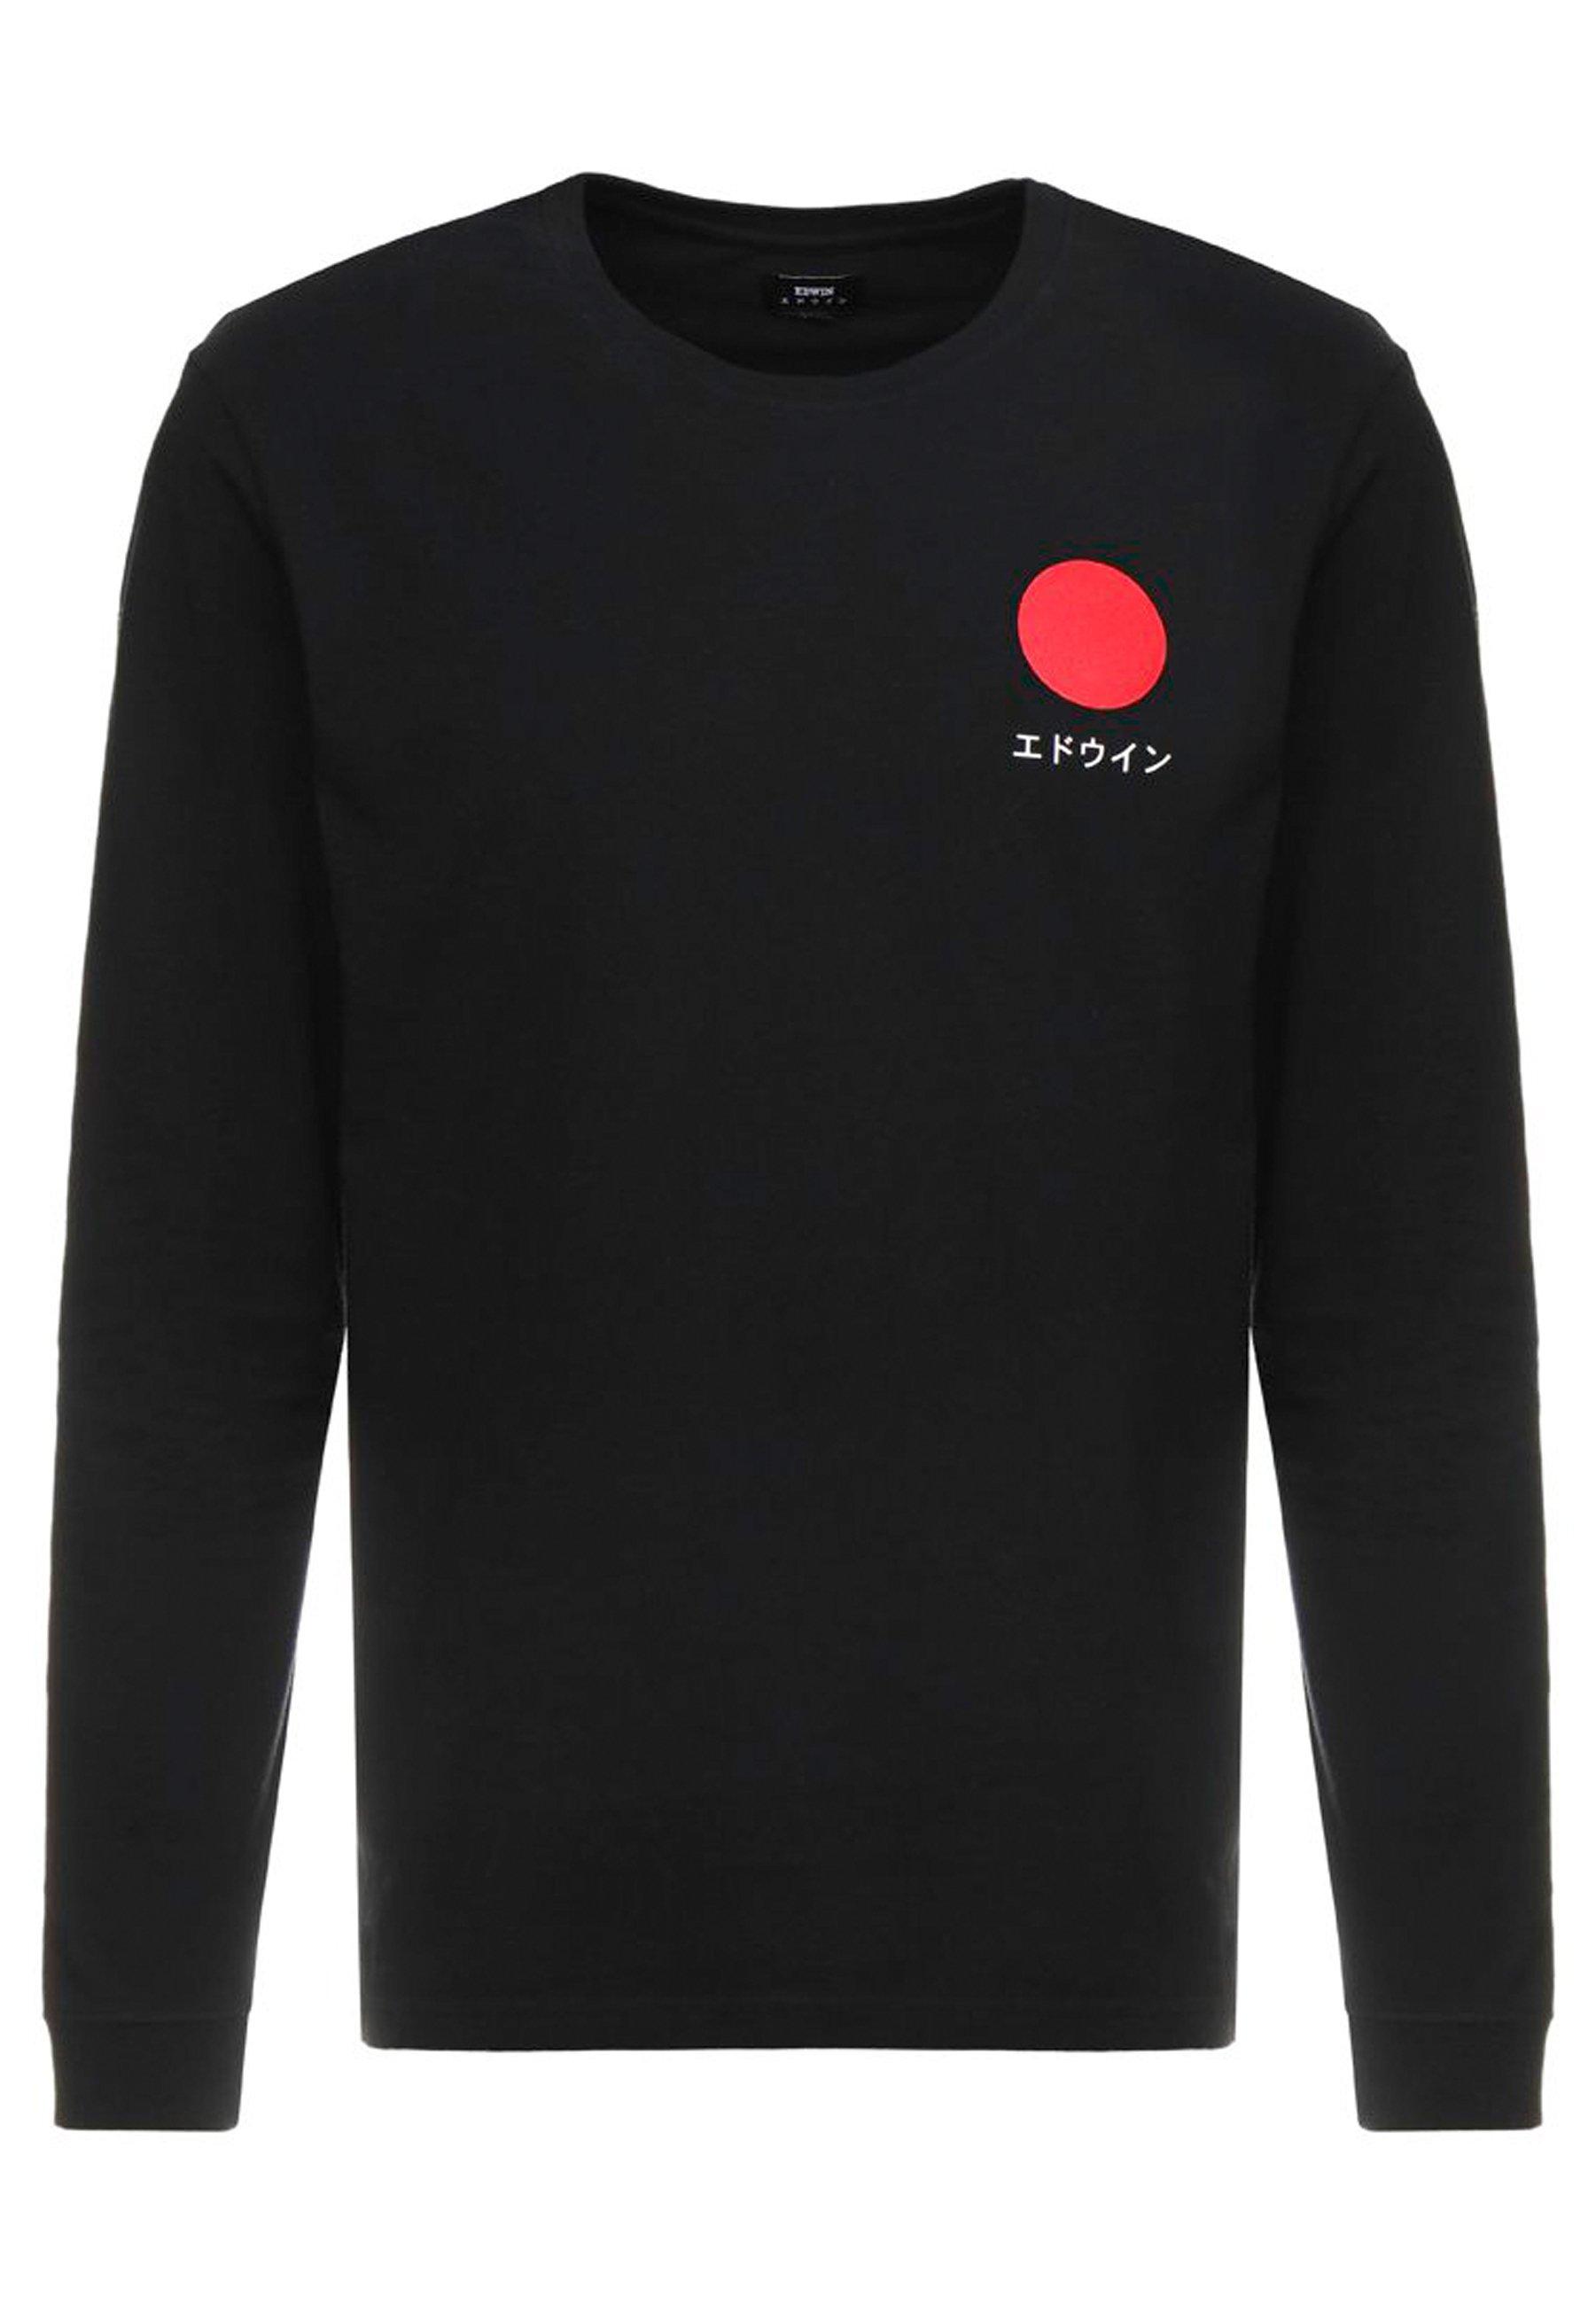 Uomo JAPANESE SUN UNISEX - Maglietta a manica lunga